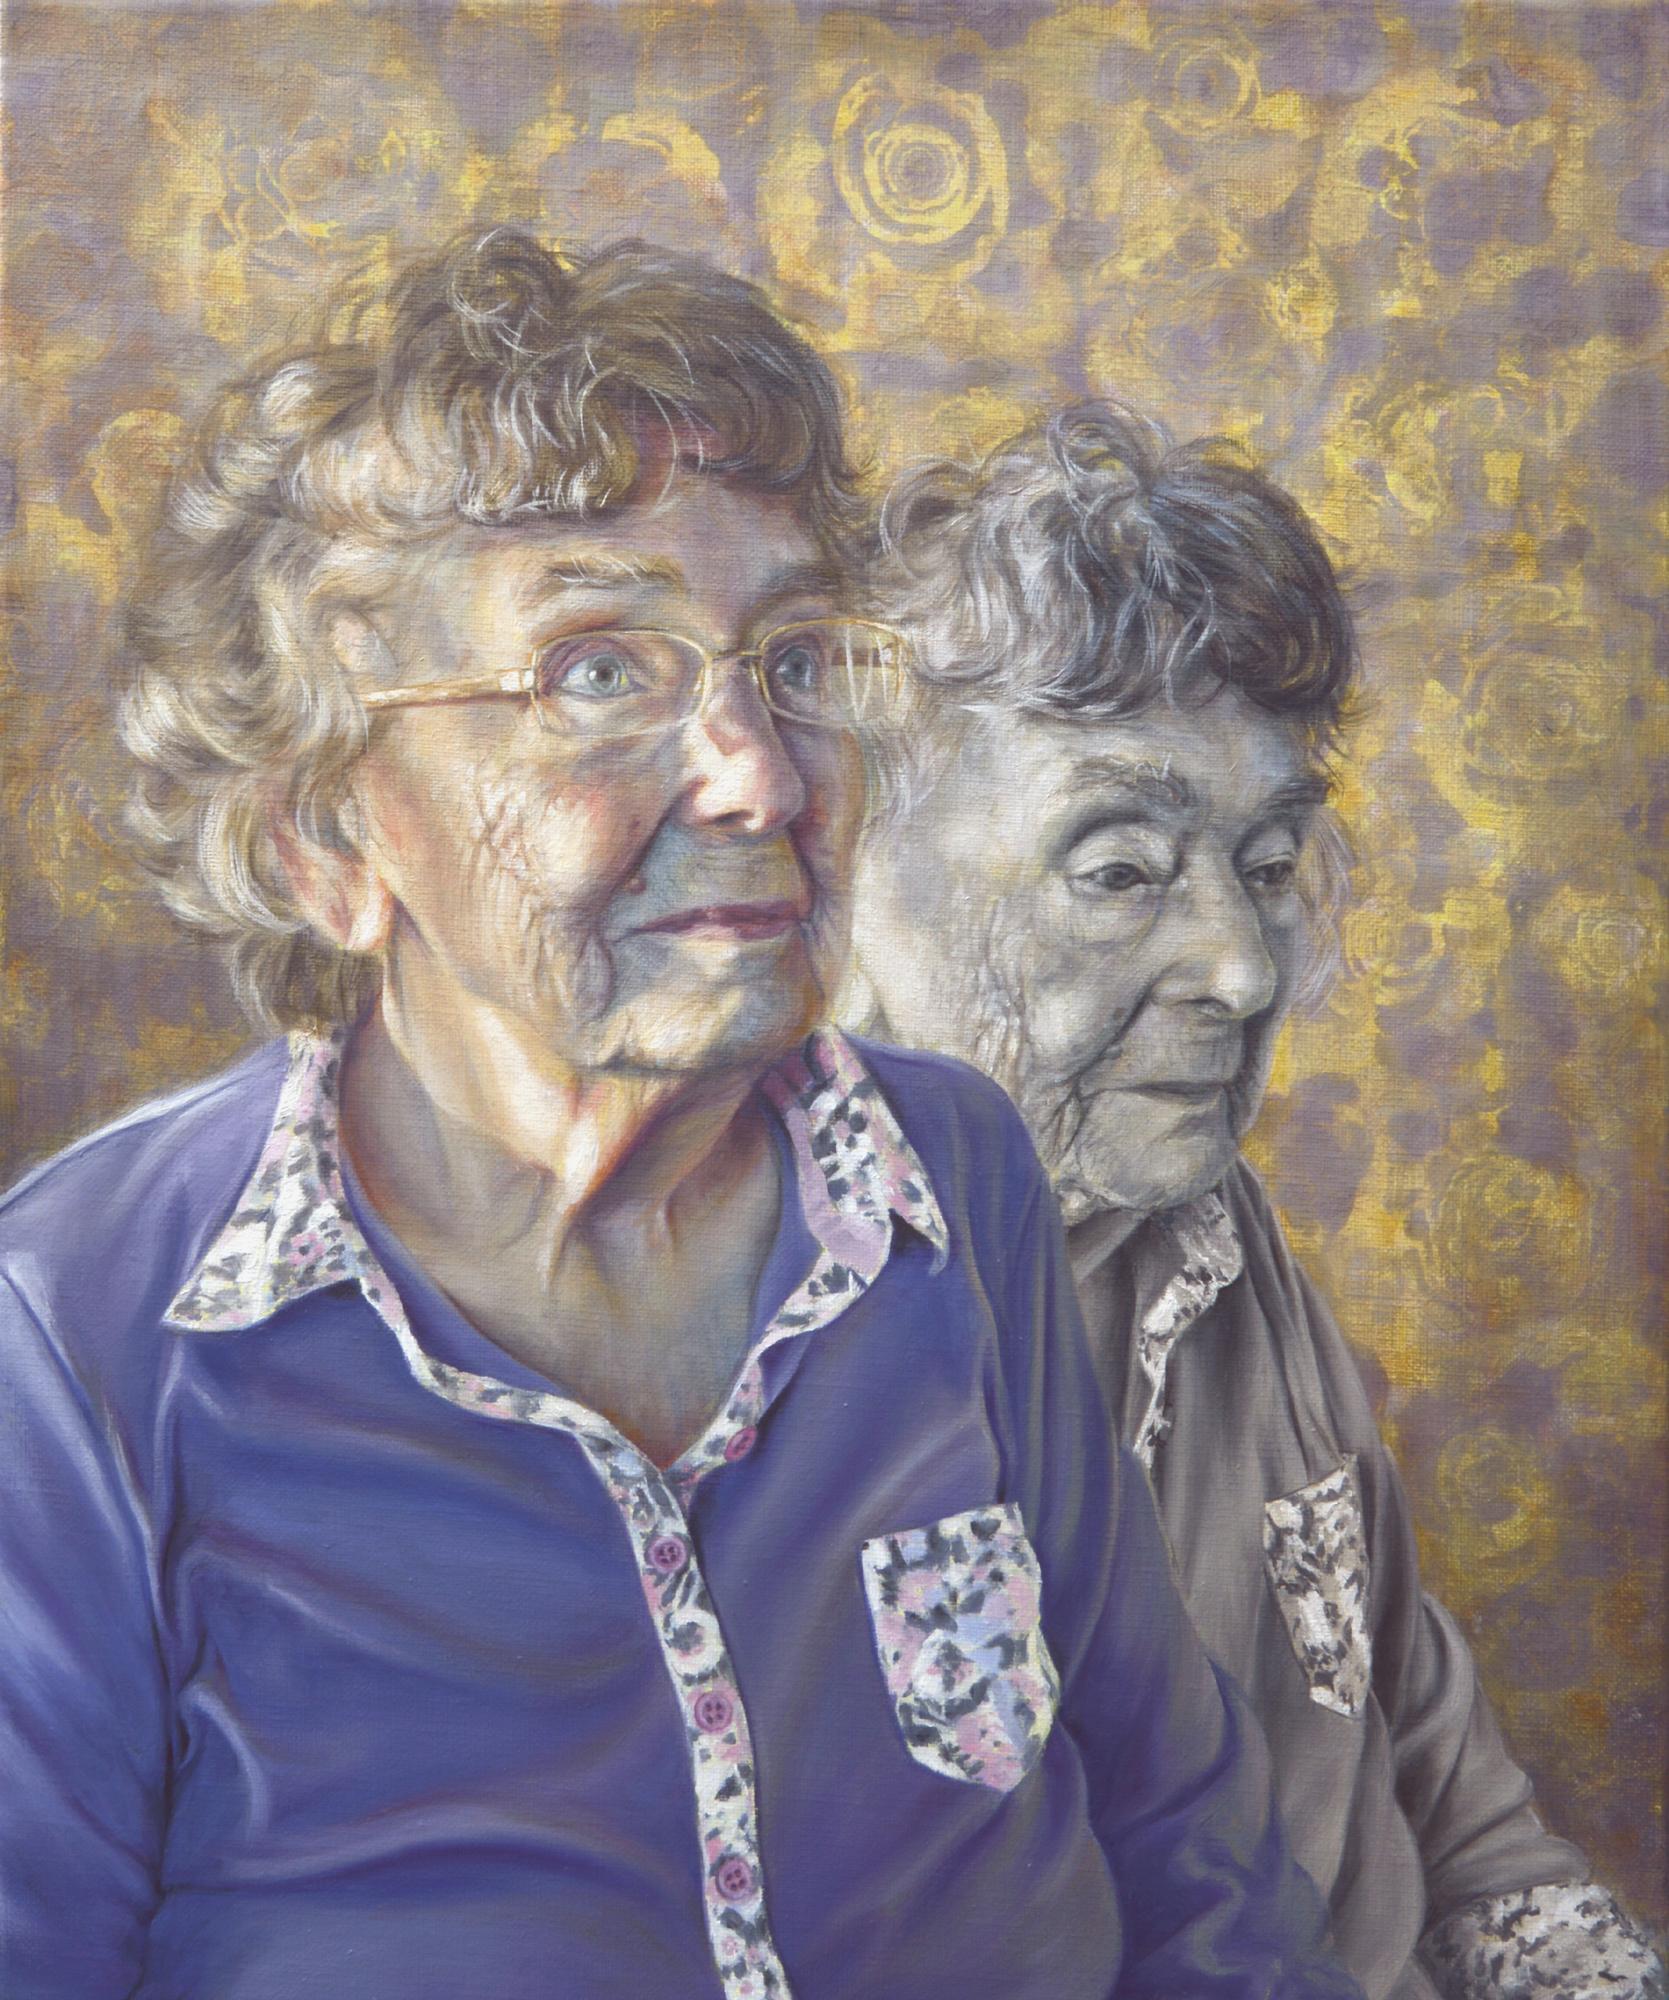 Alanda Calmus, Mrs Joan Prentice, Good Days and Bad, Oil and acrylic on linen, 46x55x2cm,  http://www.alandacalmus.com